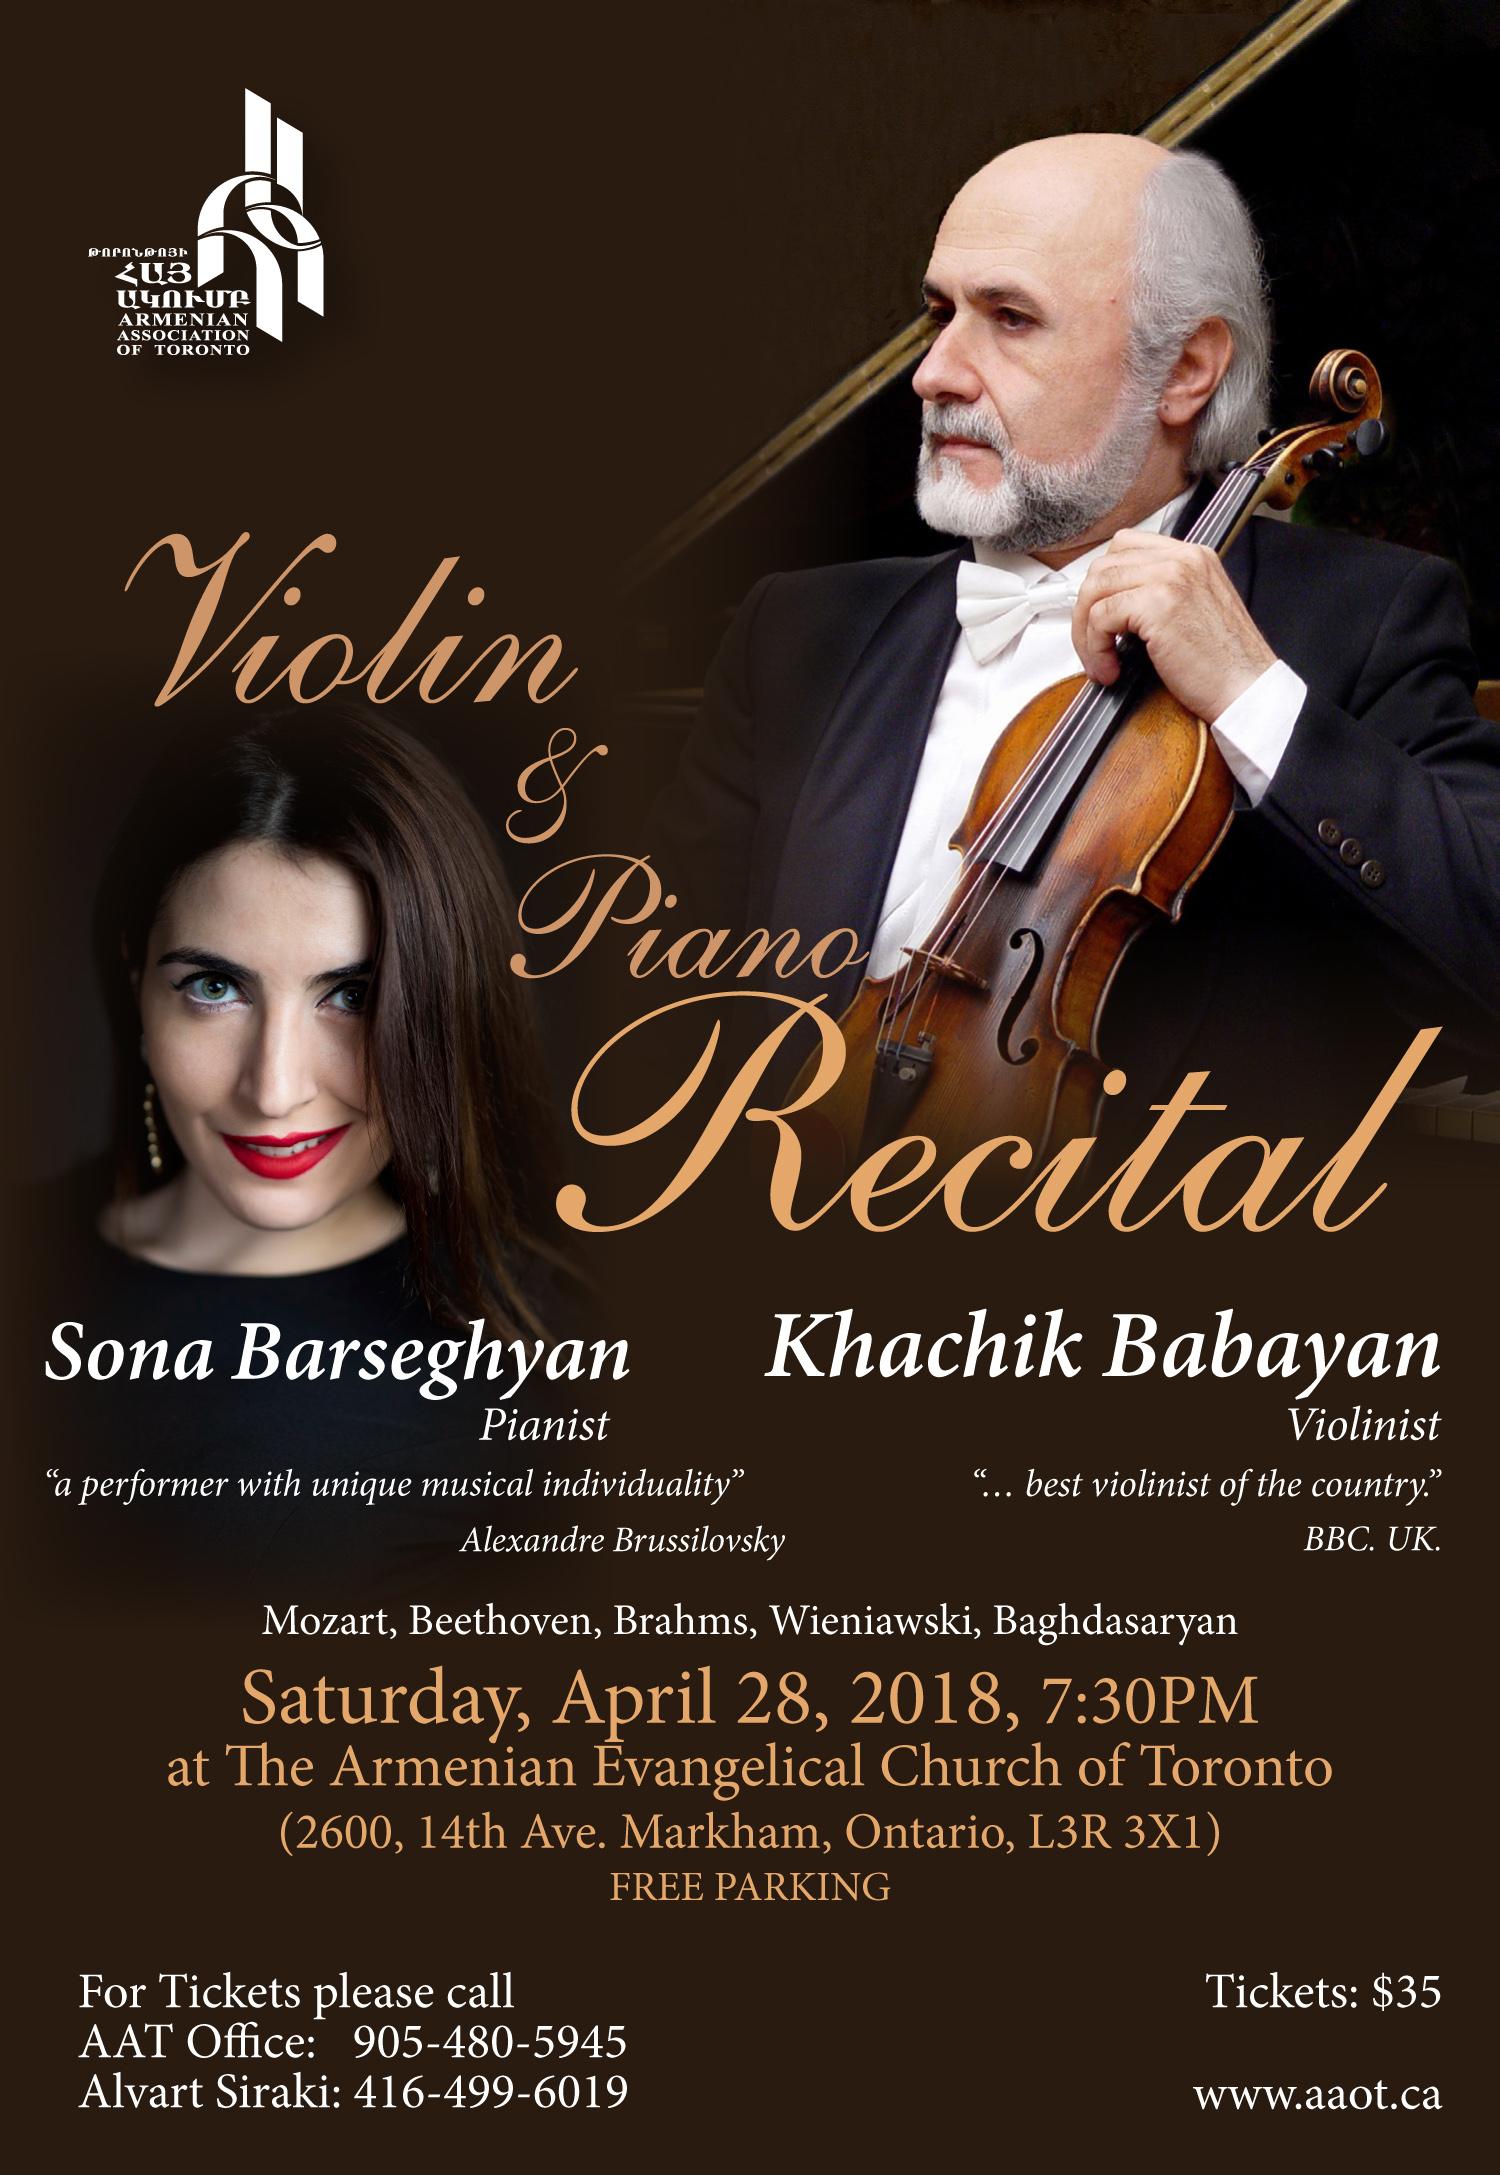 Khachik concert 2018-02 F3